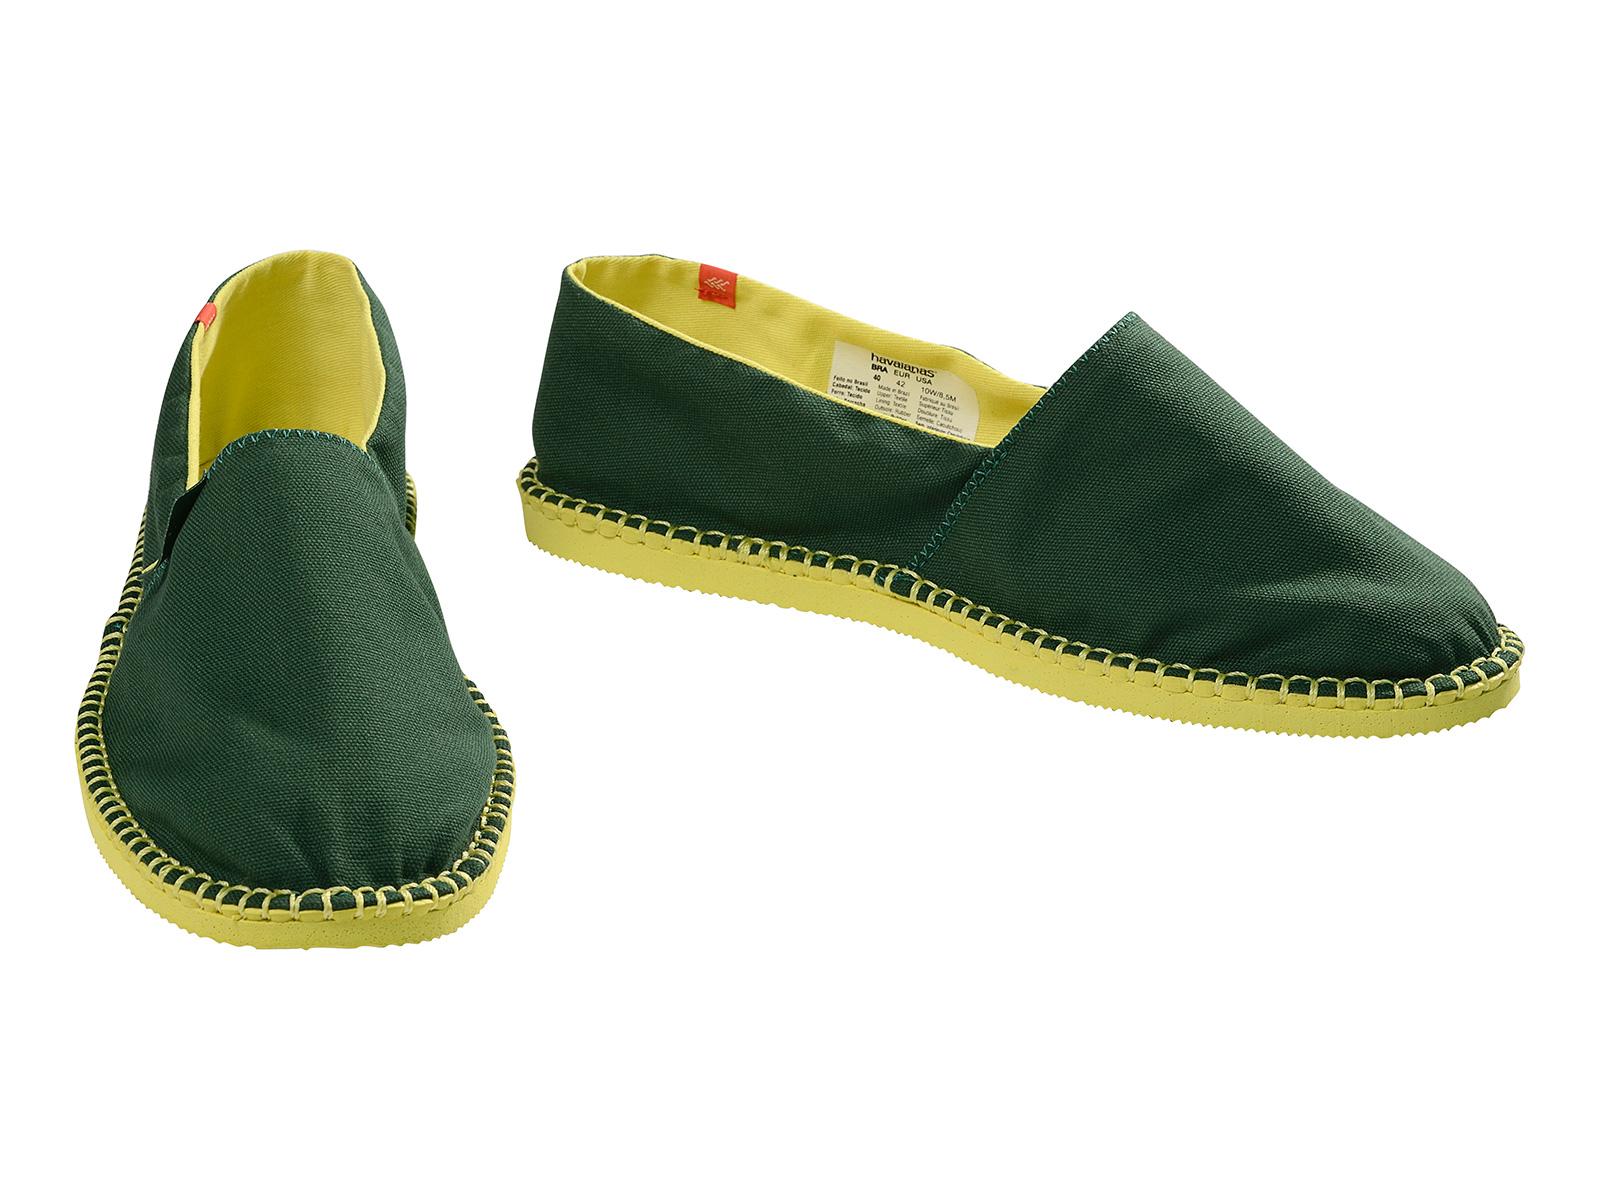 sports shoes c700e 3f1e6 Bi-colour Espadrilles Green And Yellow - Origine Ii Amazonia/yellow